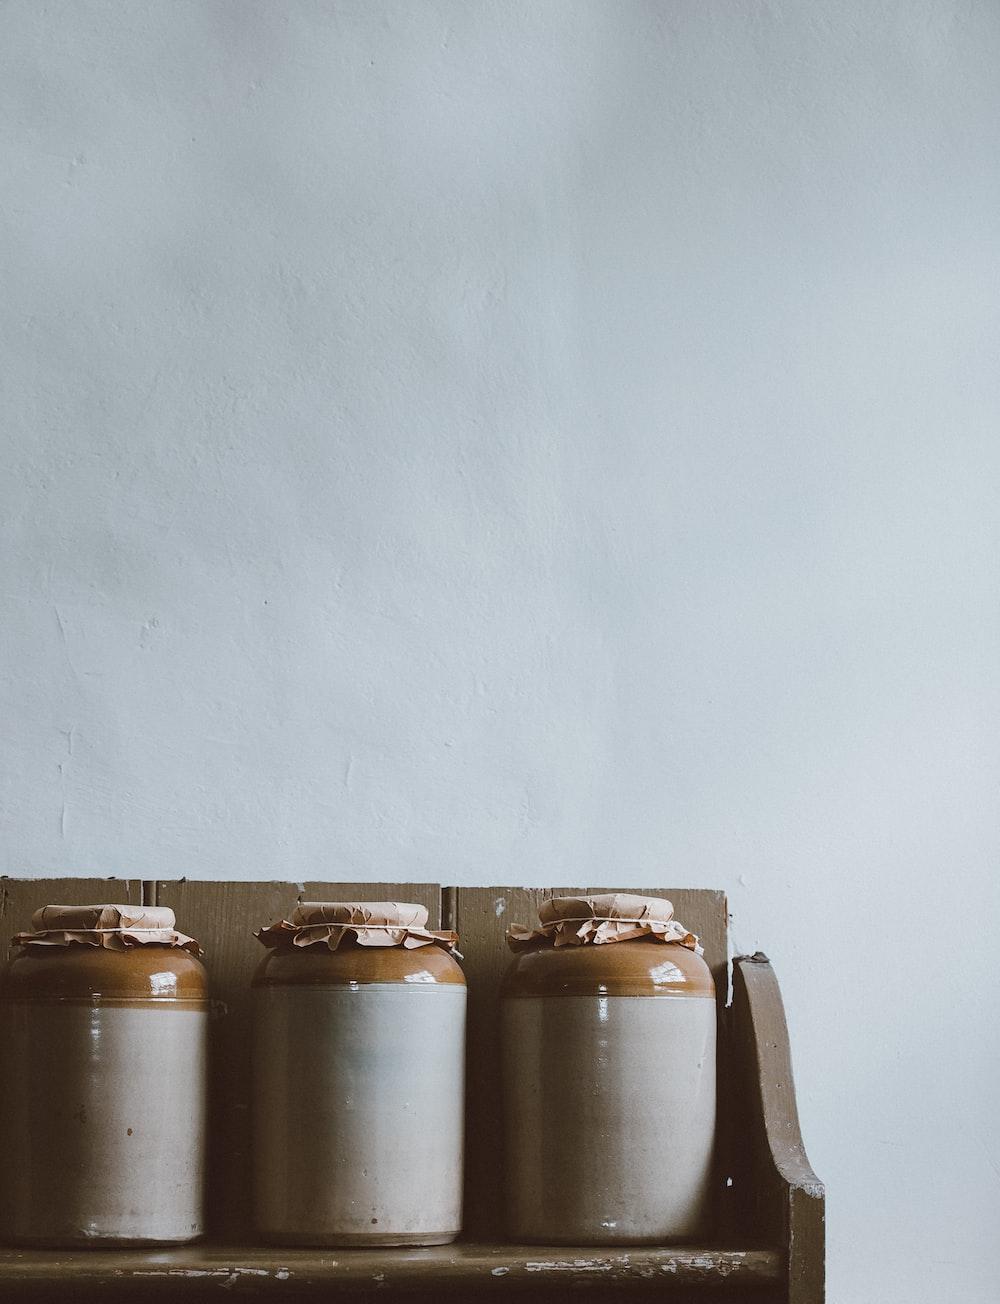 three white-and-brown ceramic jars on brown wooden rack